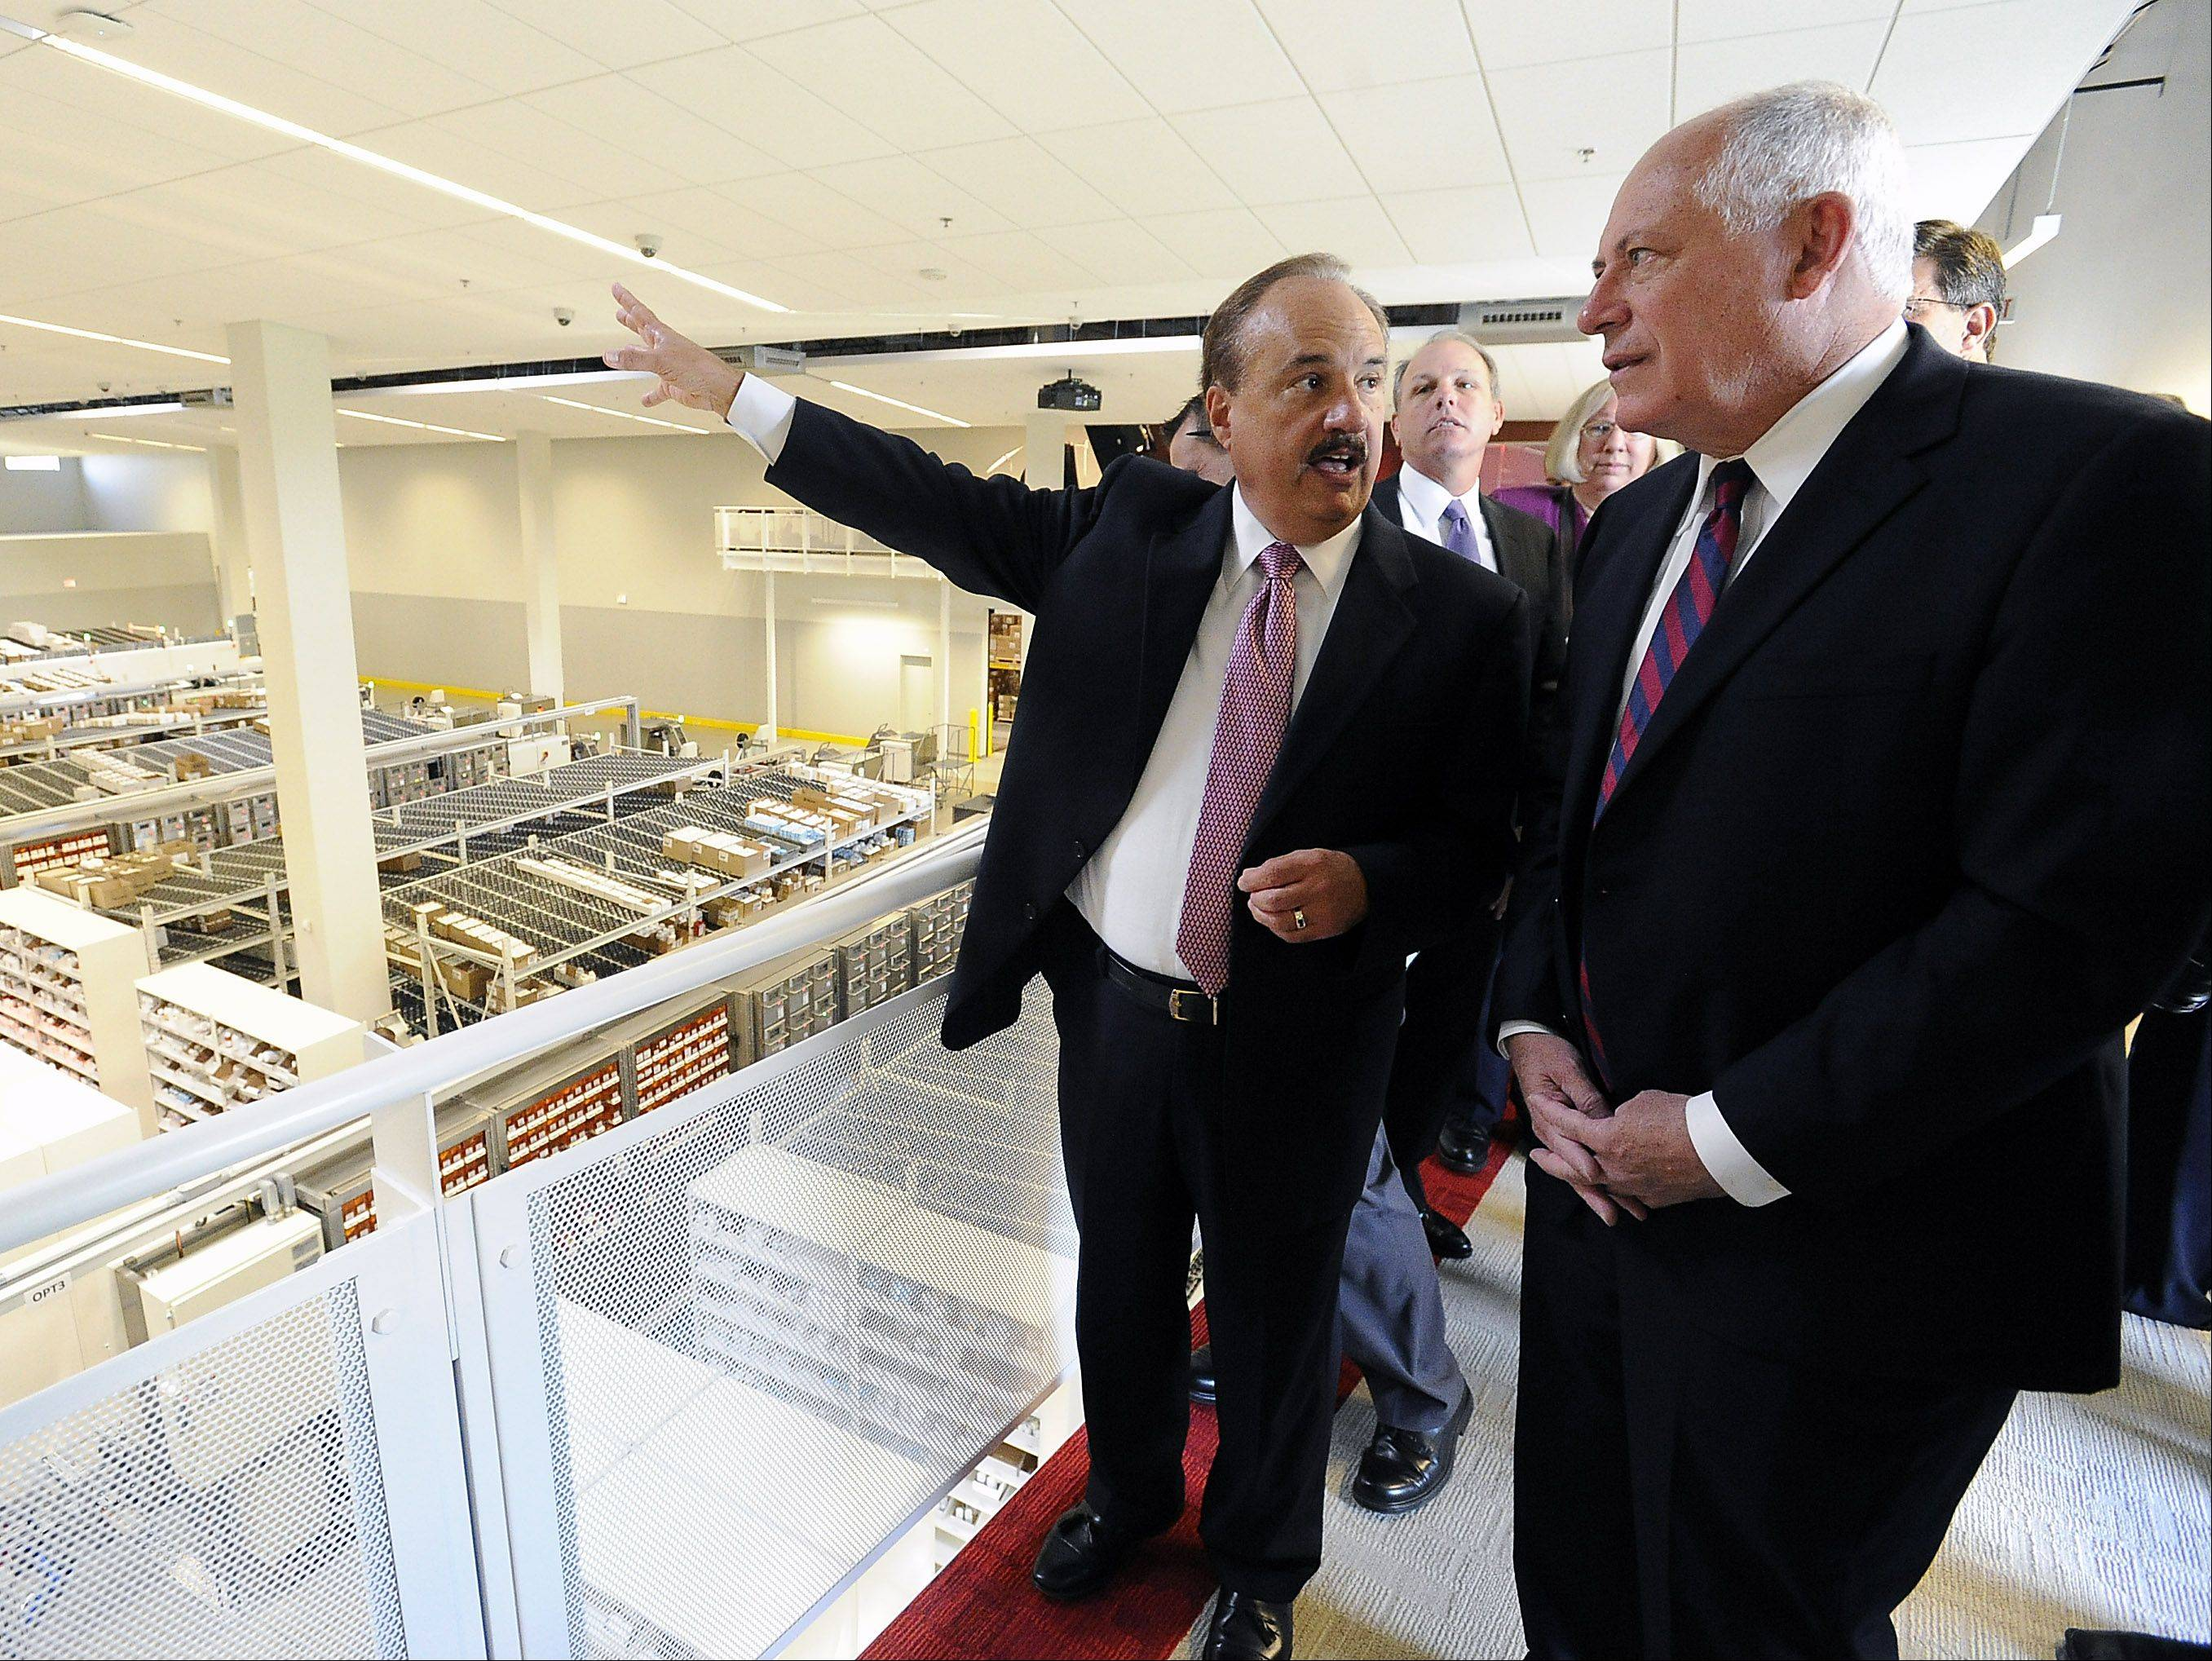 CVS Caremark's new Mount Prospect site to employ 400